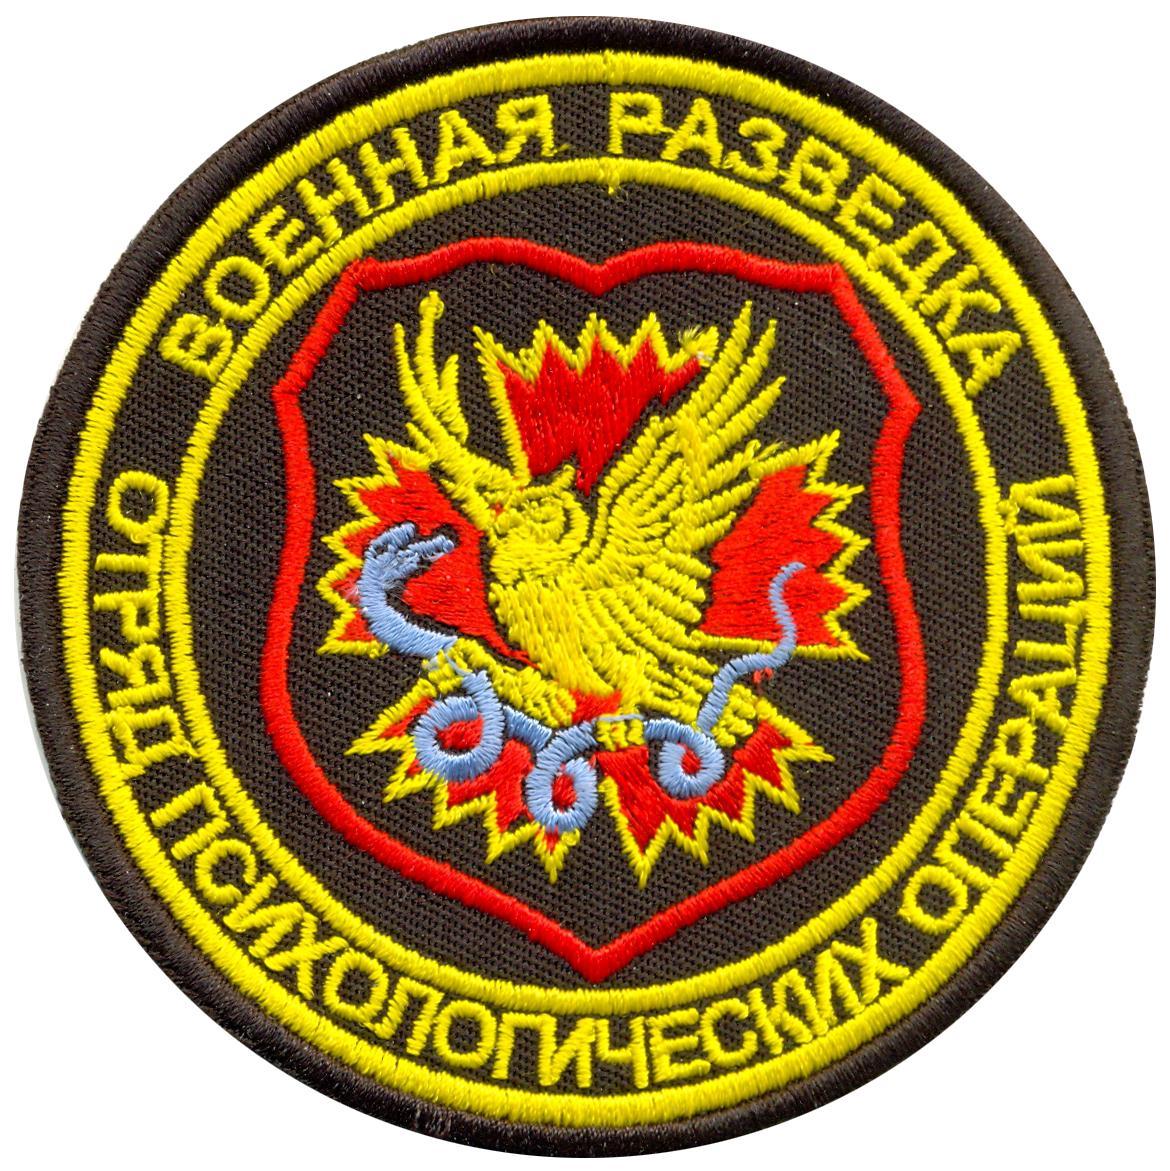 Imagini pentru russian special forces psyops photos